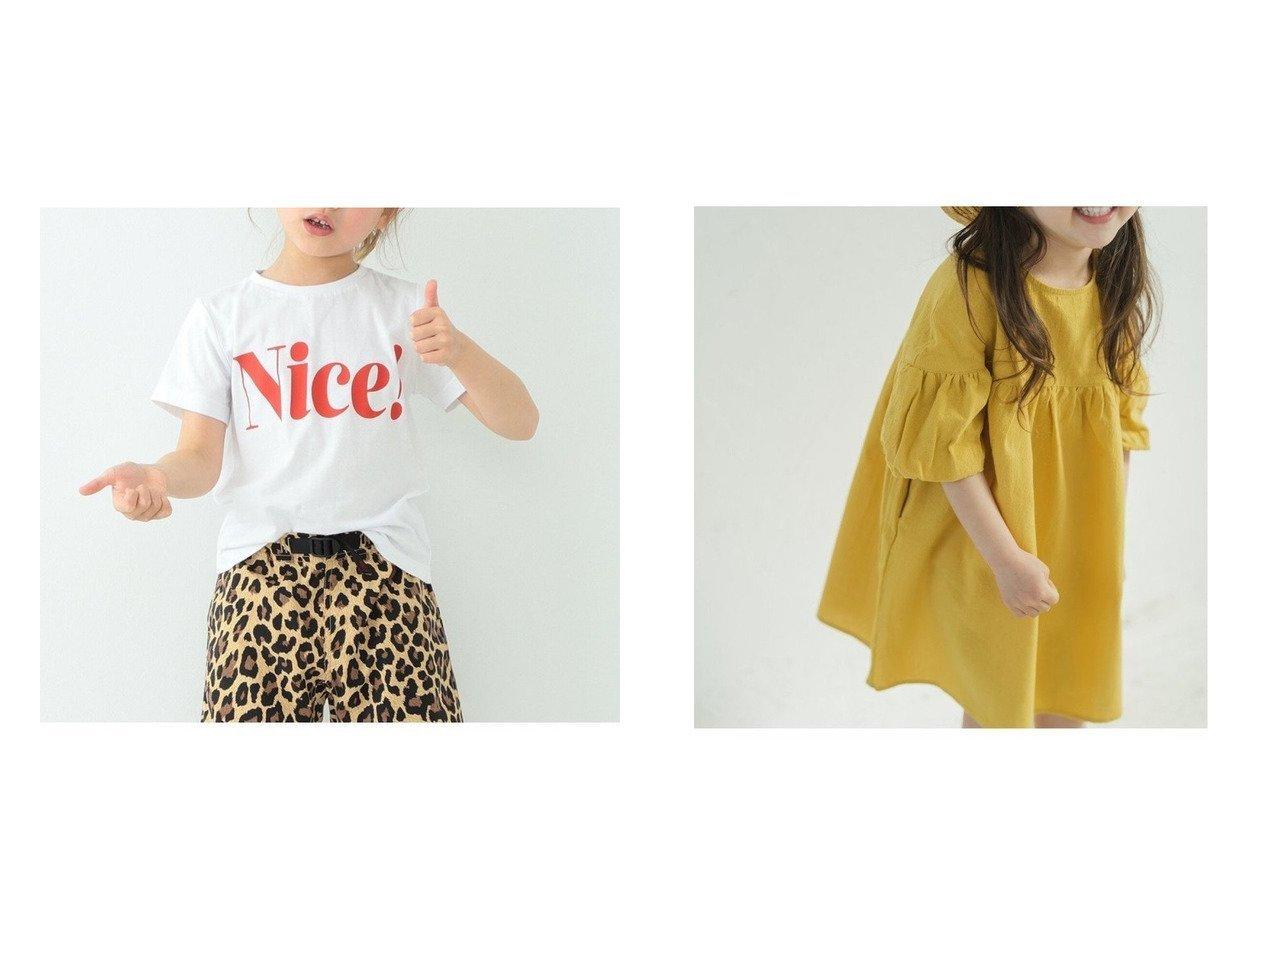 【B:MING by BEAMS / KIDS/ビーミング バイ ビームス】のプリント Tシャツ 221SS-R(80~150cm)&【riziere / KIDS/リジェール】の胸ギャザーバルーンスリーブワンピース 【KIDS】子供服のおすすめ!人気トレンド・キッズファッションの通販  おすすめで人気の流行・トレンド、ファッションの通販商品 メンズファッション・キッズファッション・インテリア・家具・レディースファッション・服の通販 founy(ファニー) https://founy.com/ ファッション Fashion キッズファッション KIDS トップス・カットソー Tops/Tees/Kids ワンピース Dress/Kids S/S・春夏 SS・Spring/Summer カットソー フロント プリント 人気 再入荷 Restock/Back in Stock/Re Arrival 春 Spring おすすめ Recommend ソックス |ID:crp329100000034863